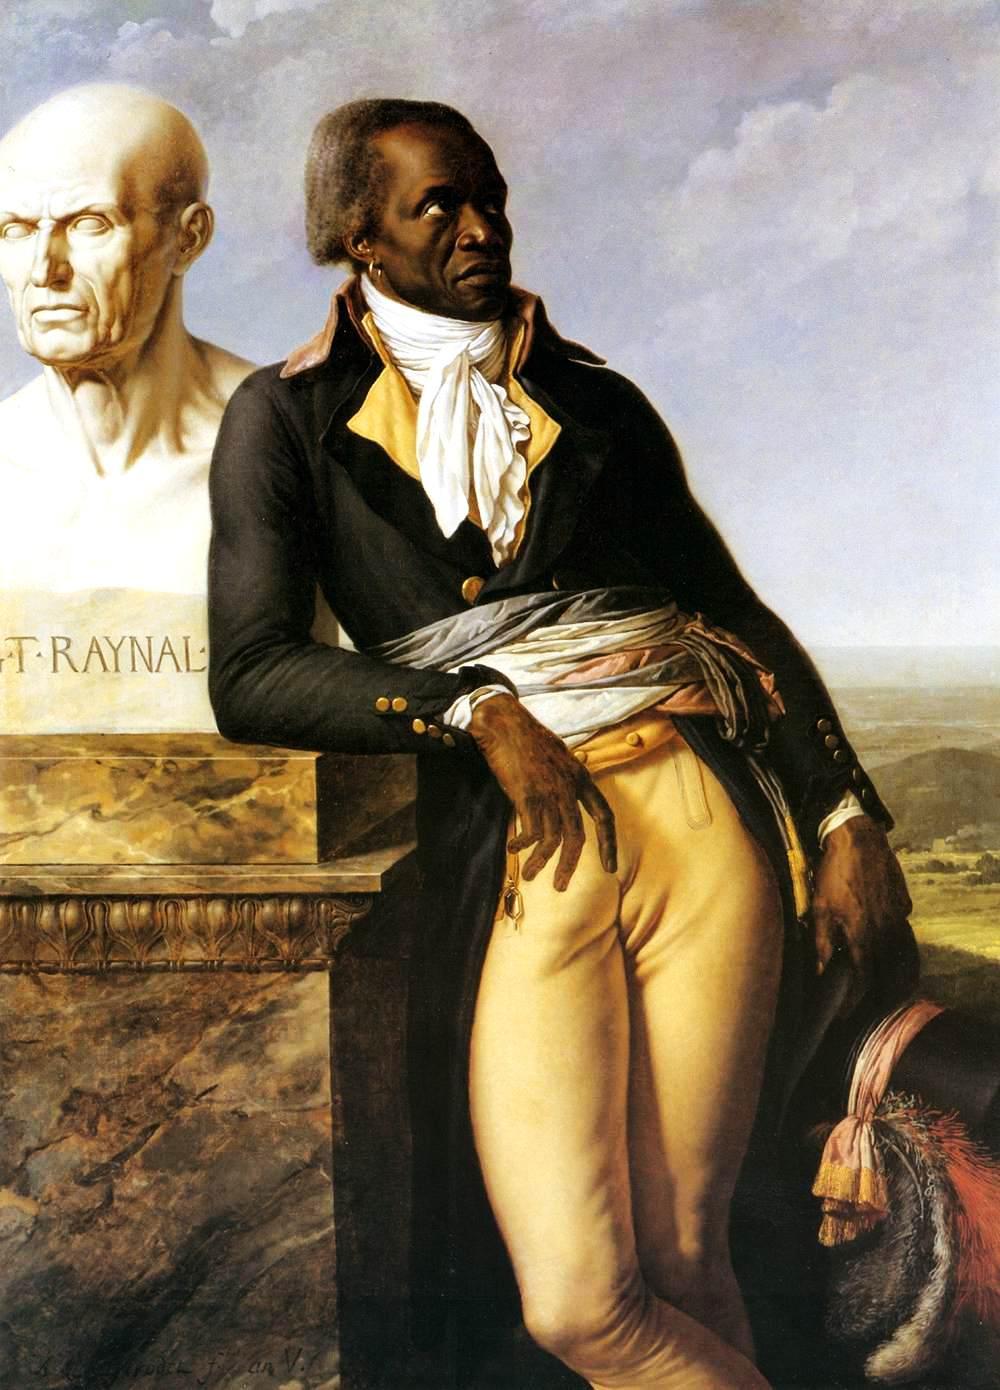 www.histoire-image.org